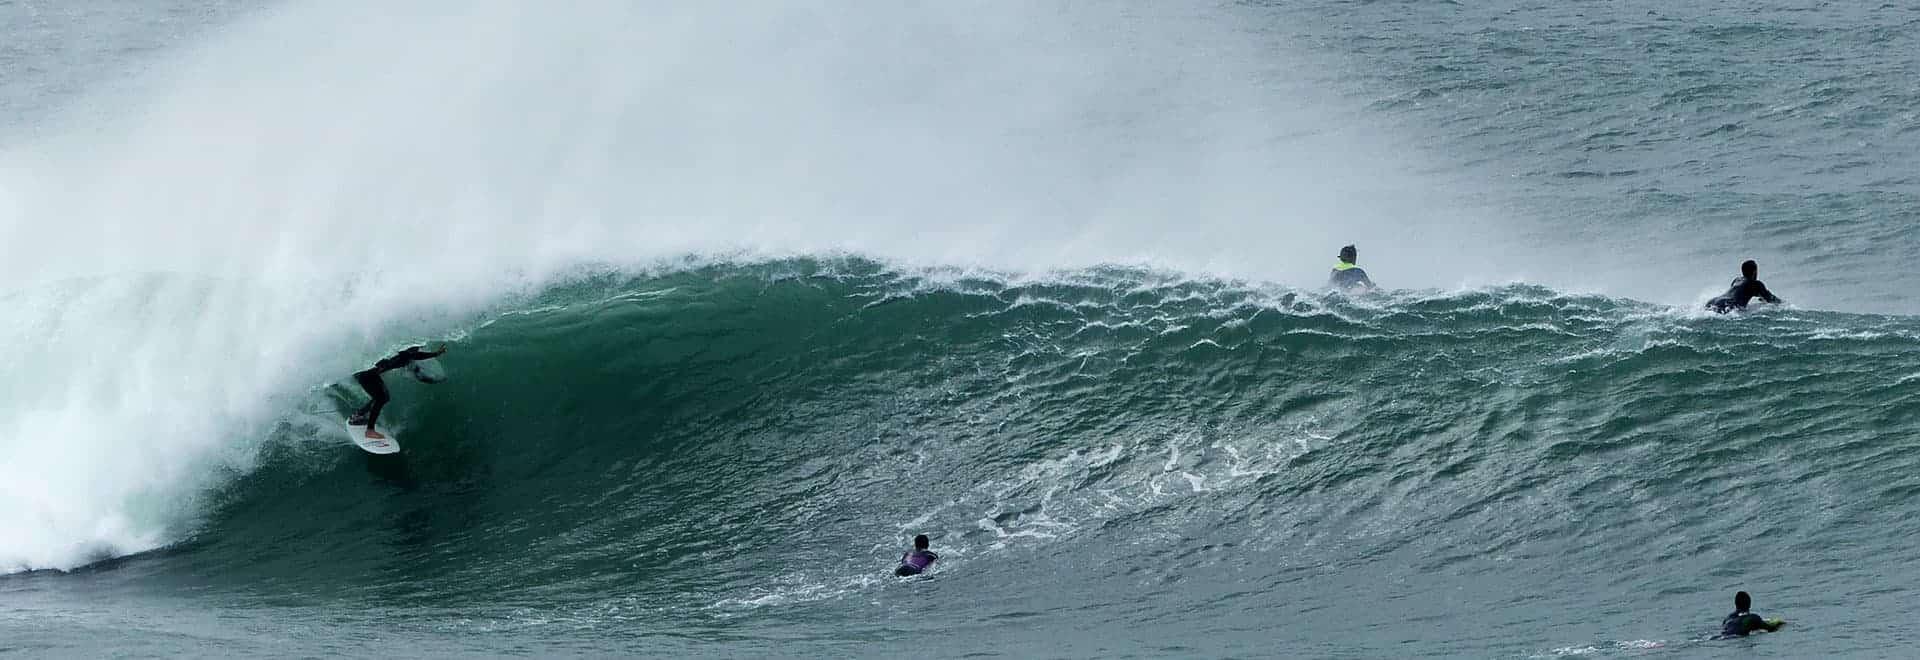 surf perfect waves at guincho lisbon